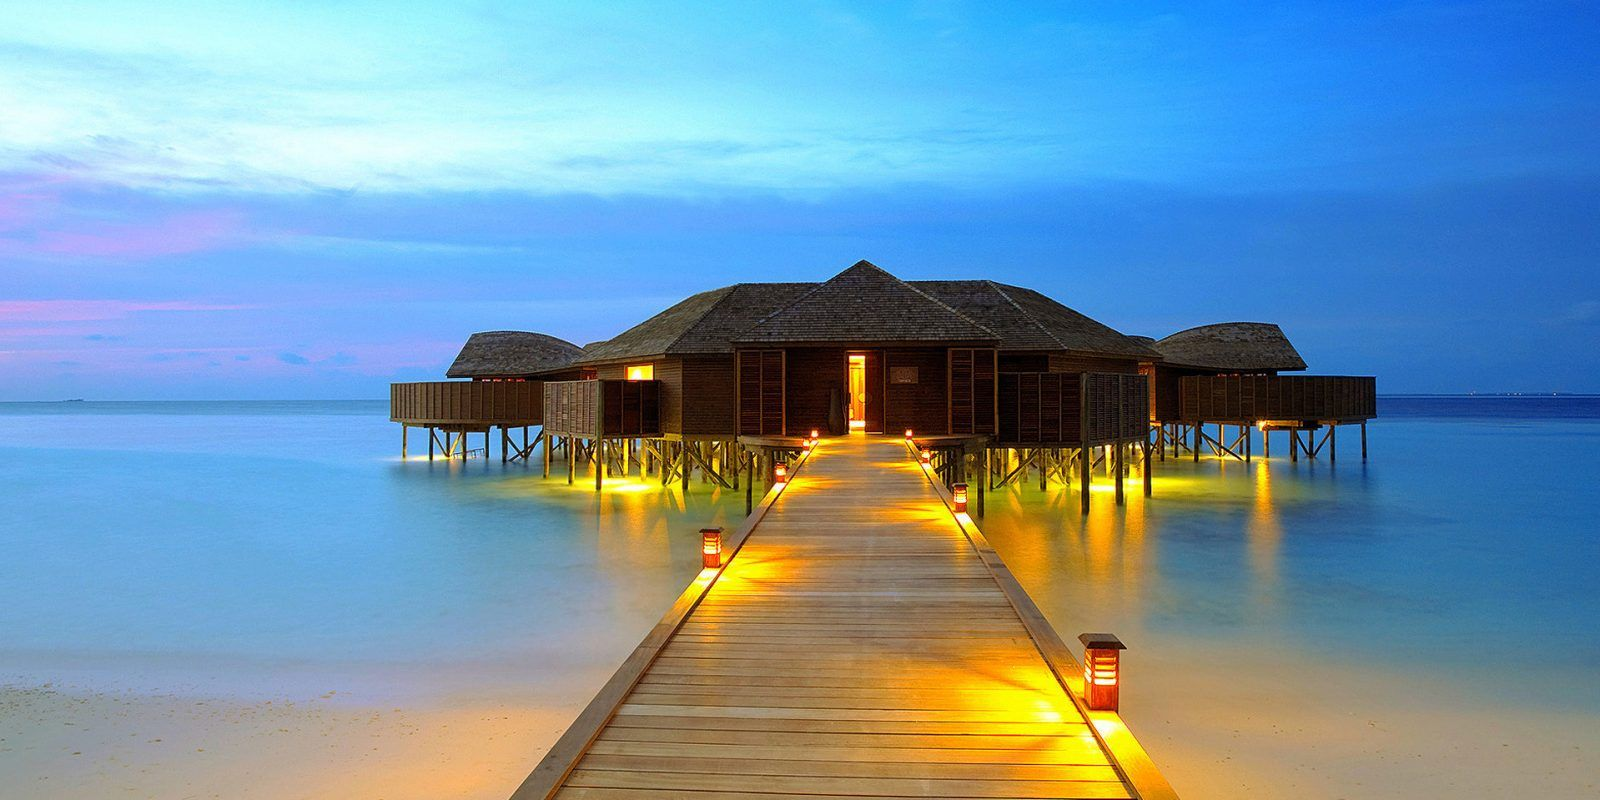 Enbarcadero picture of aquamarina beach hotel cancun tripadvisor - M S De 25 Ideas Incre Bles Sobre Hoteles Baratos Cancun En Pinterest Mejores Hoteles En Cancun Hoteles En Azul Y Mejor Hotel De Cancun